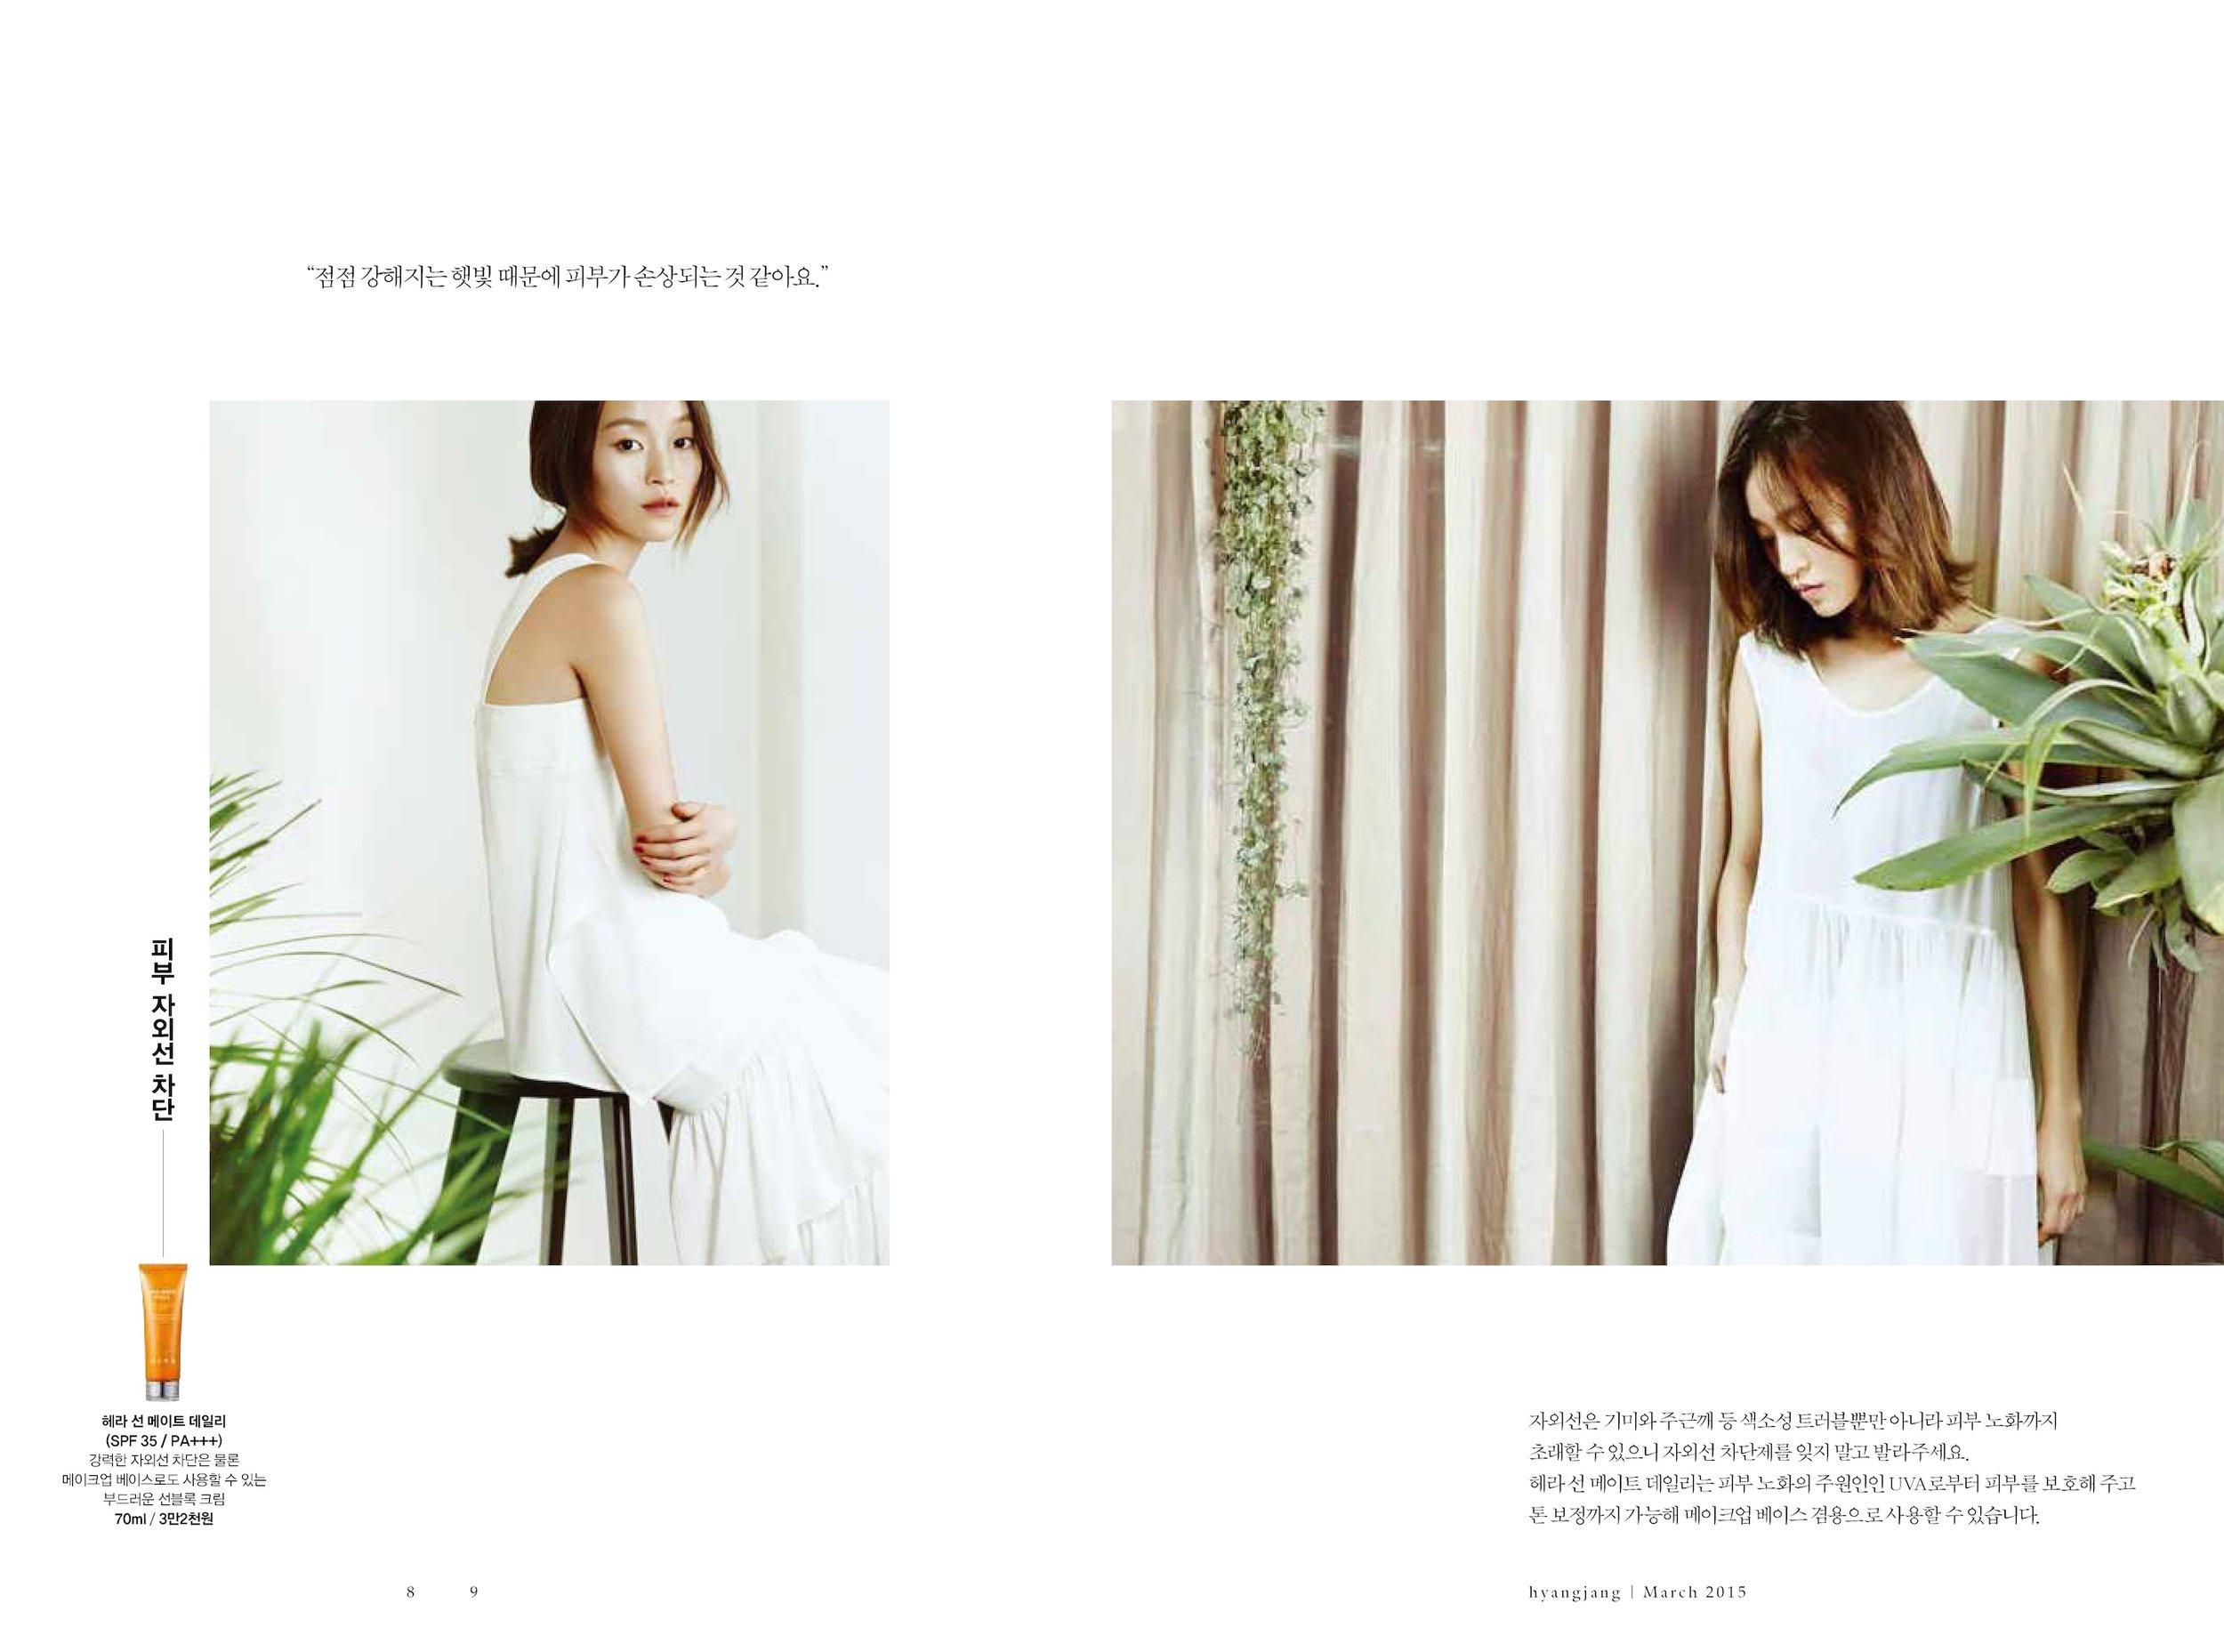 hyangjang-201503_페이지_05.jpeg